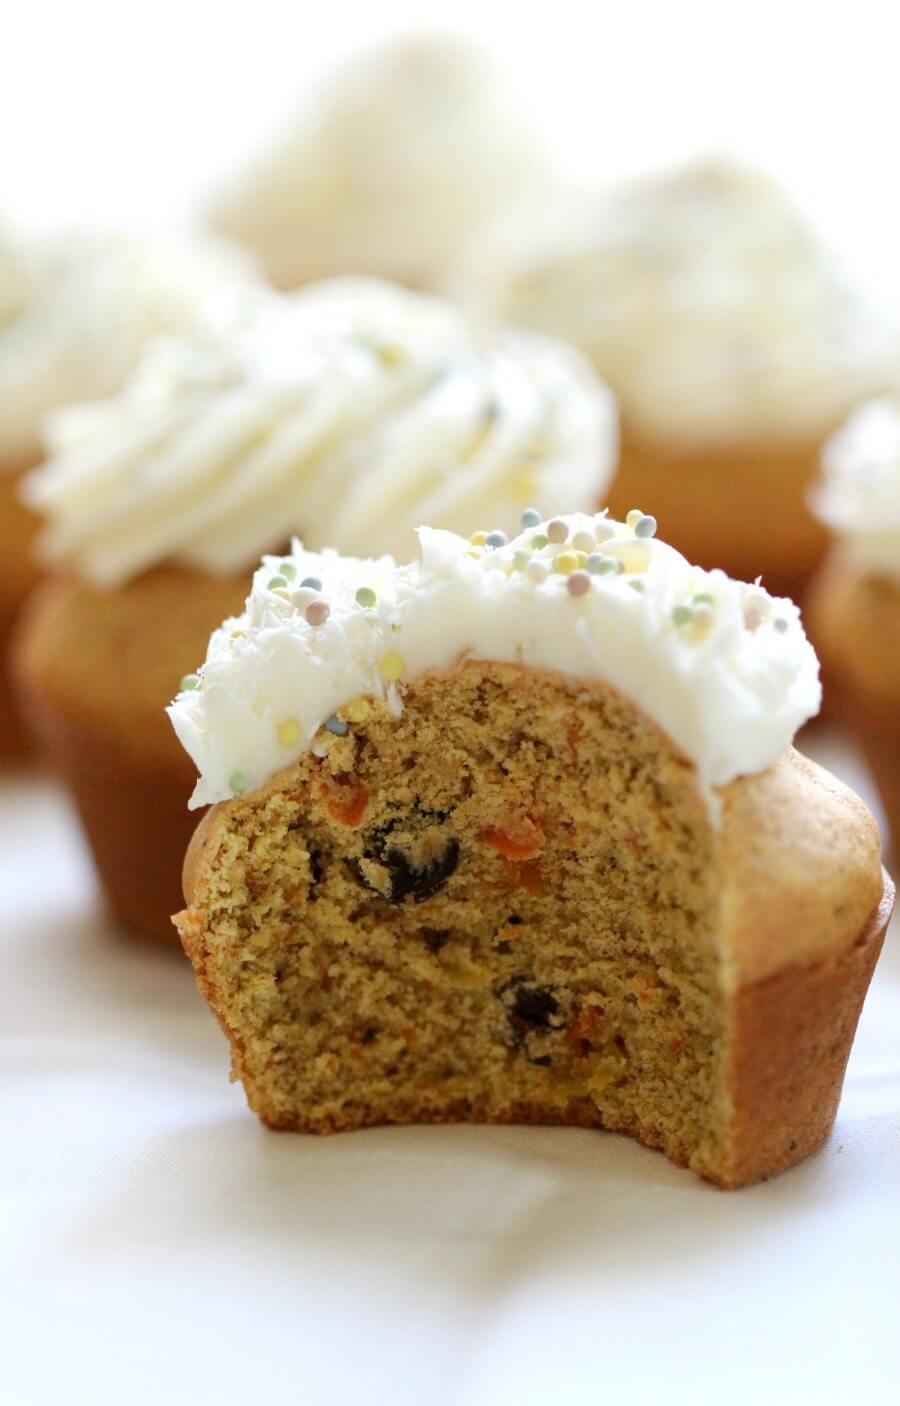 half eaten gluten-free carrot cake cupcake with vegan cream cheese frosting